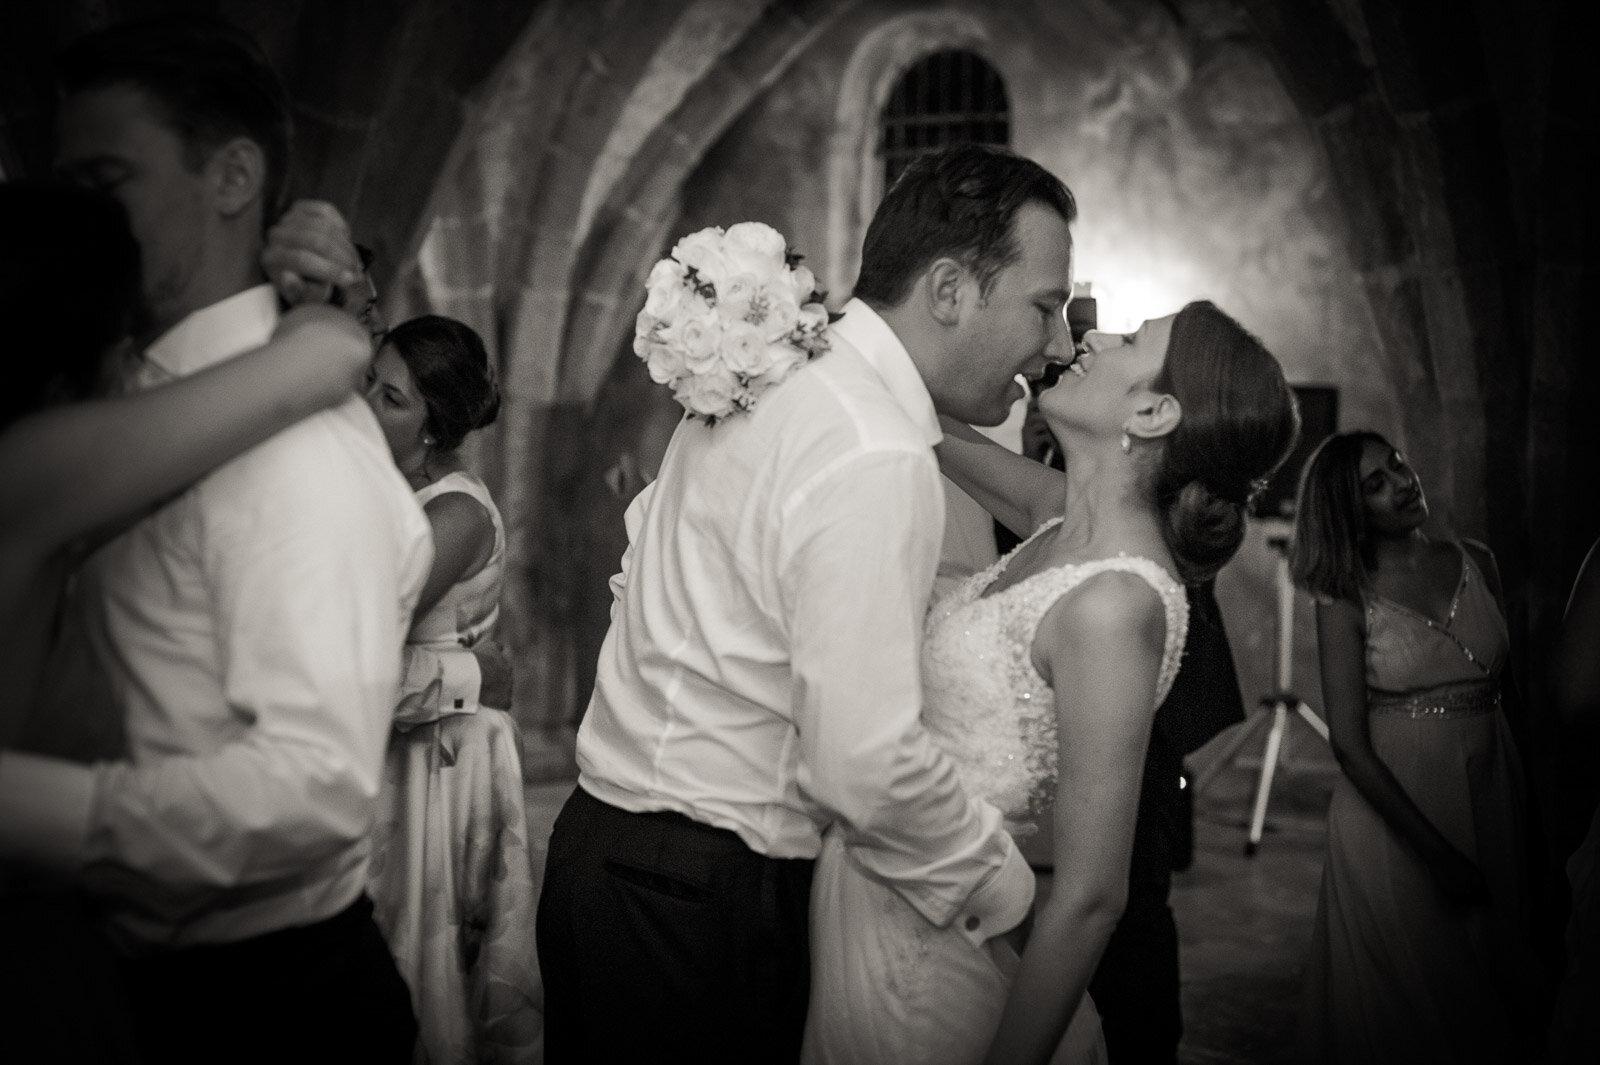 Russian Wedding in Villa Cimbrone Costiera Amalfitana 36.jpg